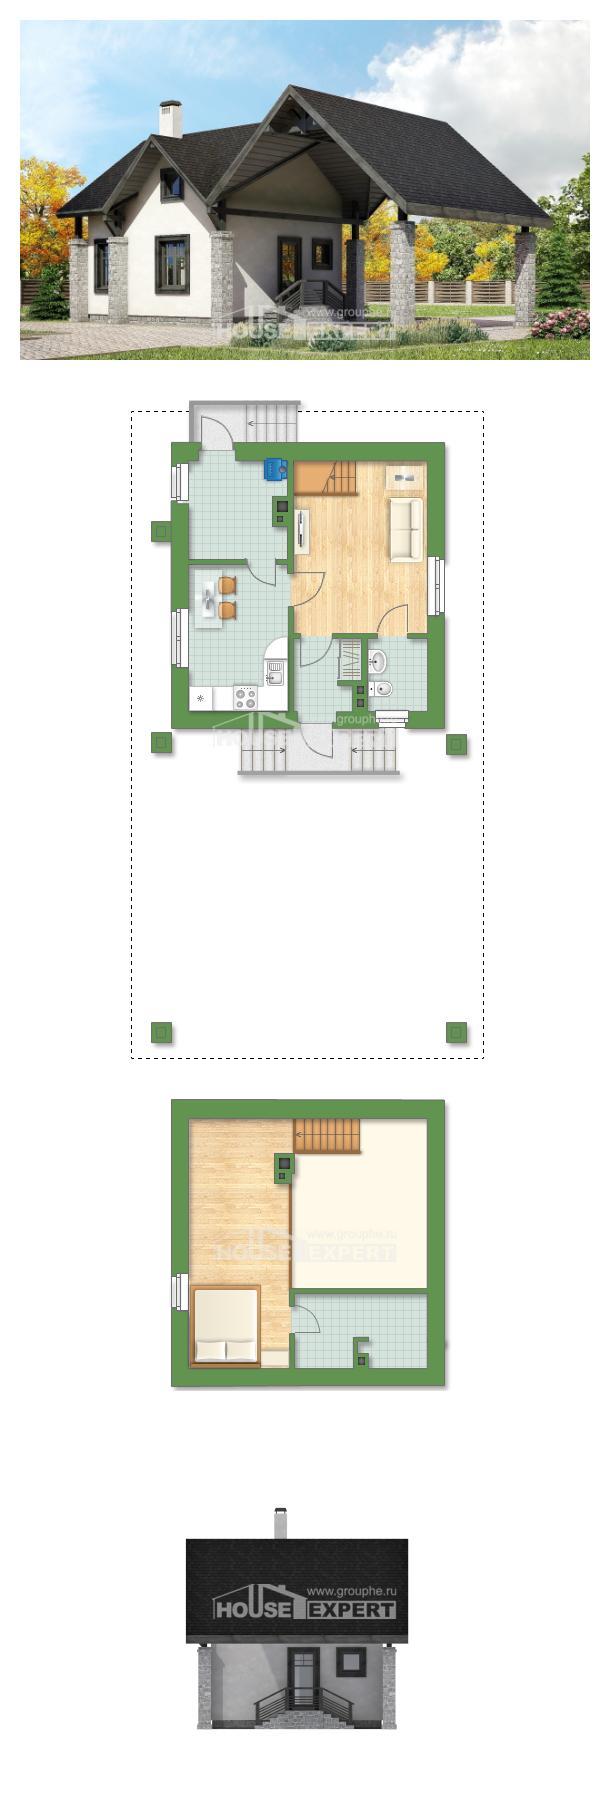 Projekt domu 060-001-R   House Expert